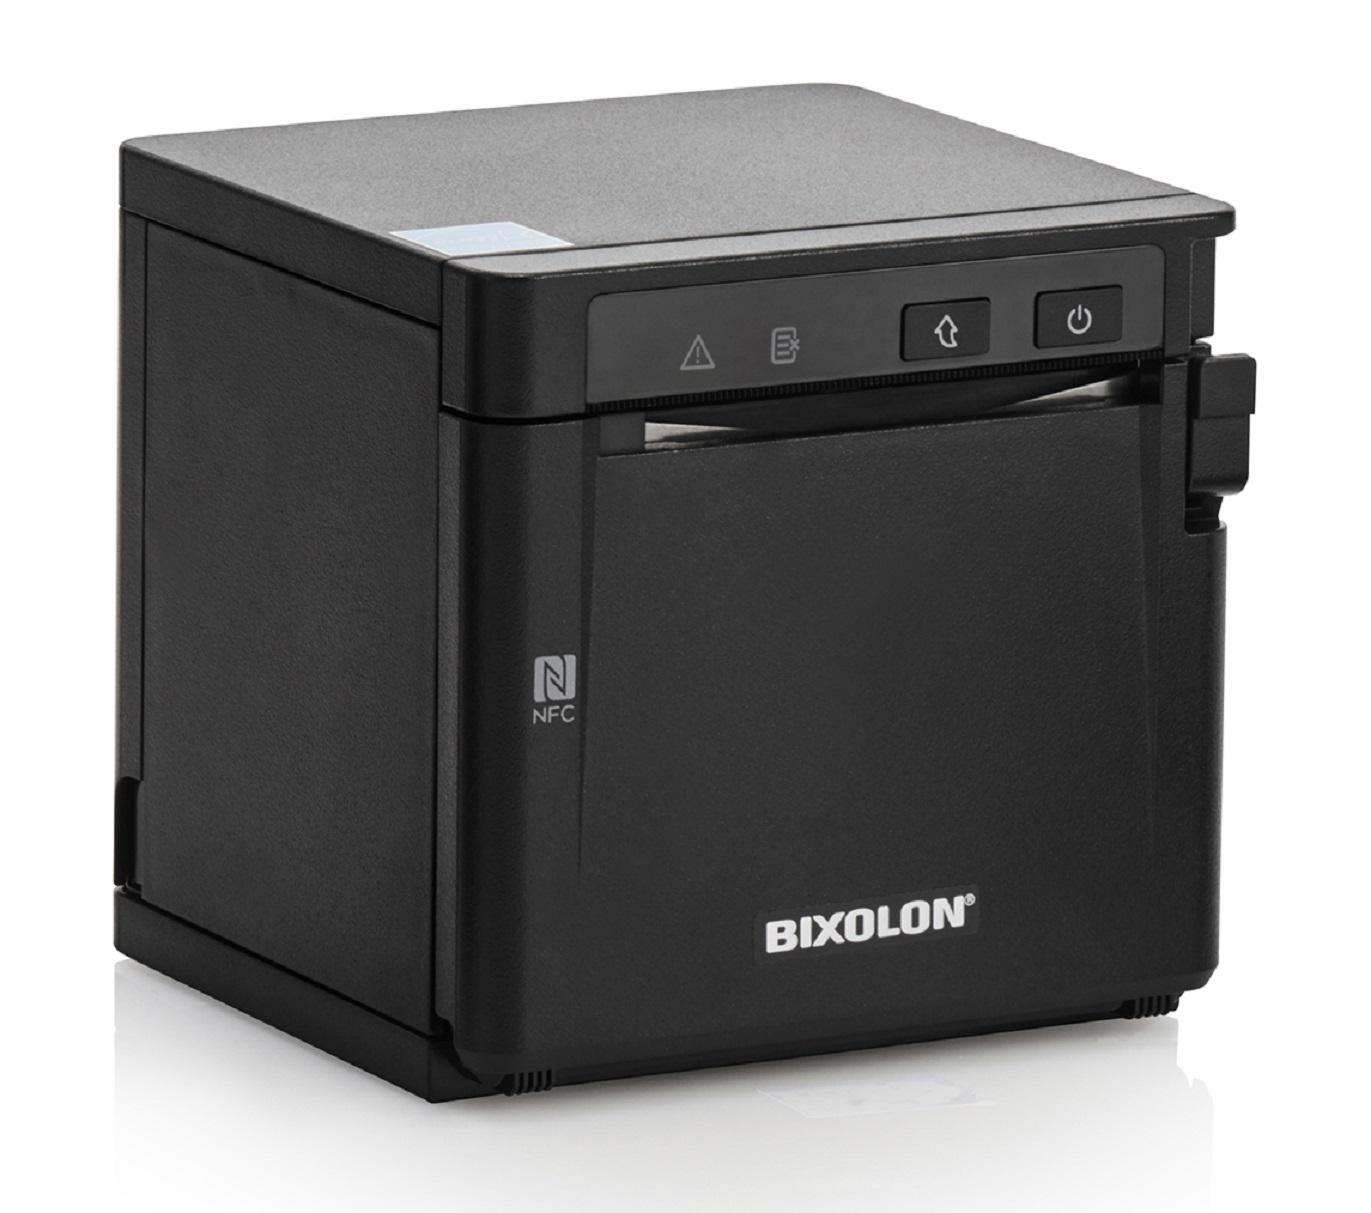 Bixolon SRP-Q302 mPOS Receipt Printer